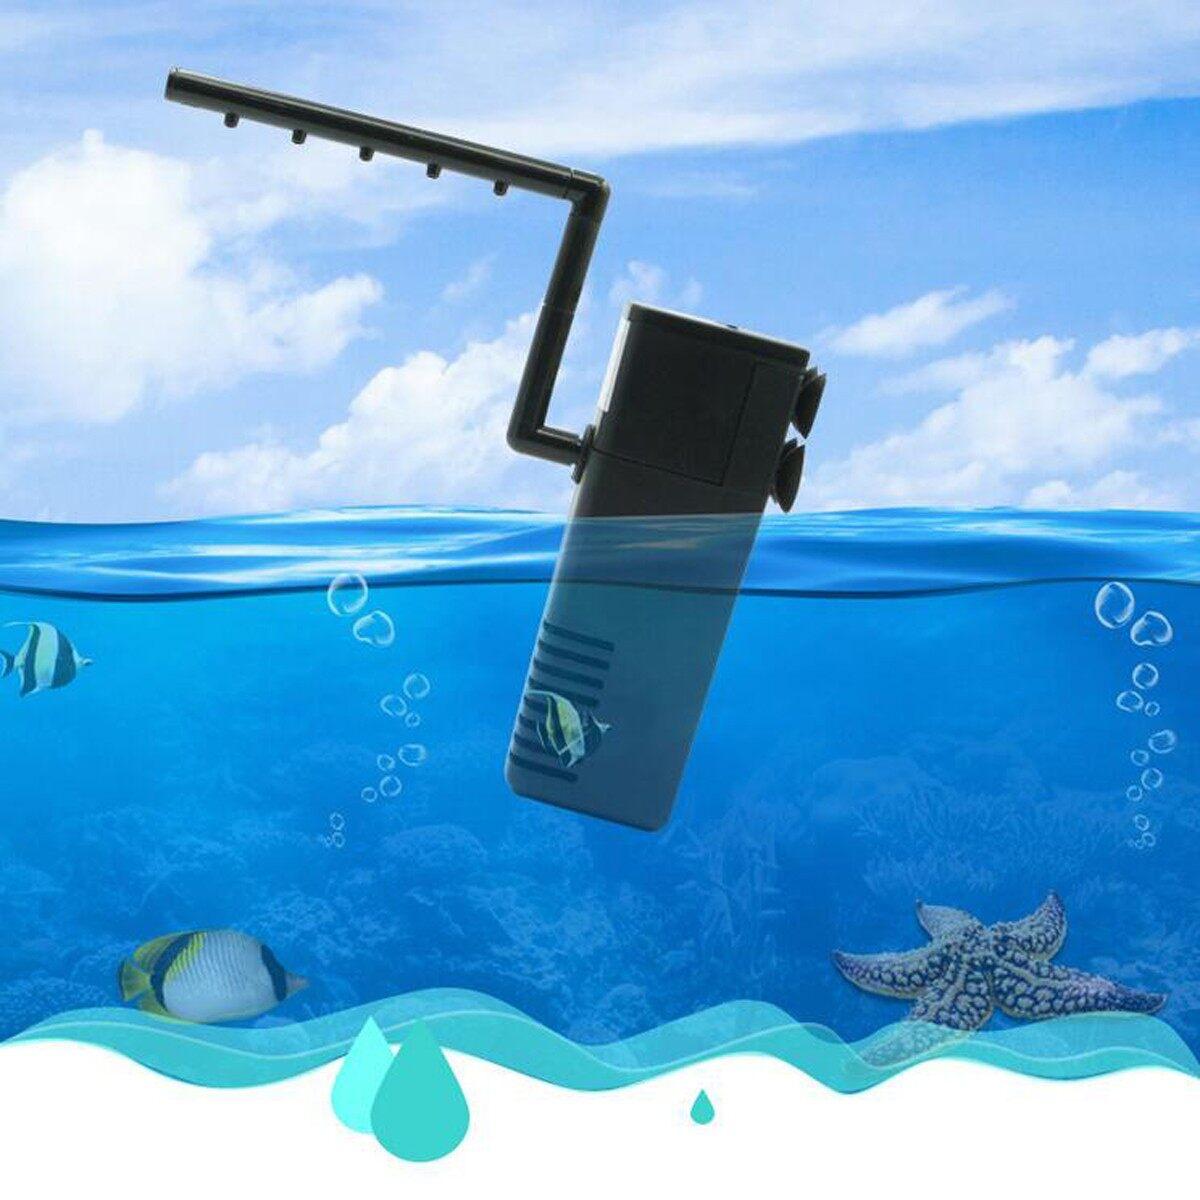 Submersible Aquarium Fish Tank Internal Filter Water Pump Spray Bar HX-188F - intl